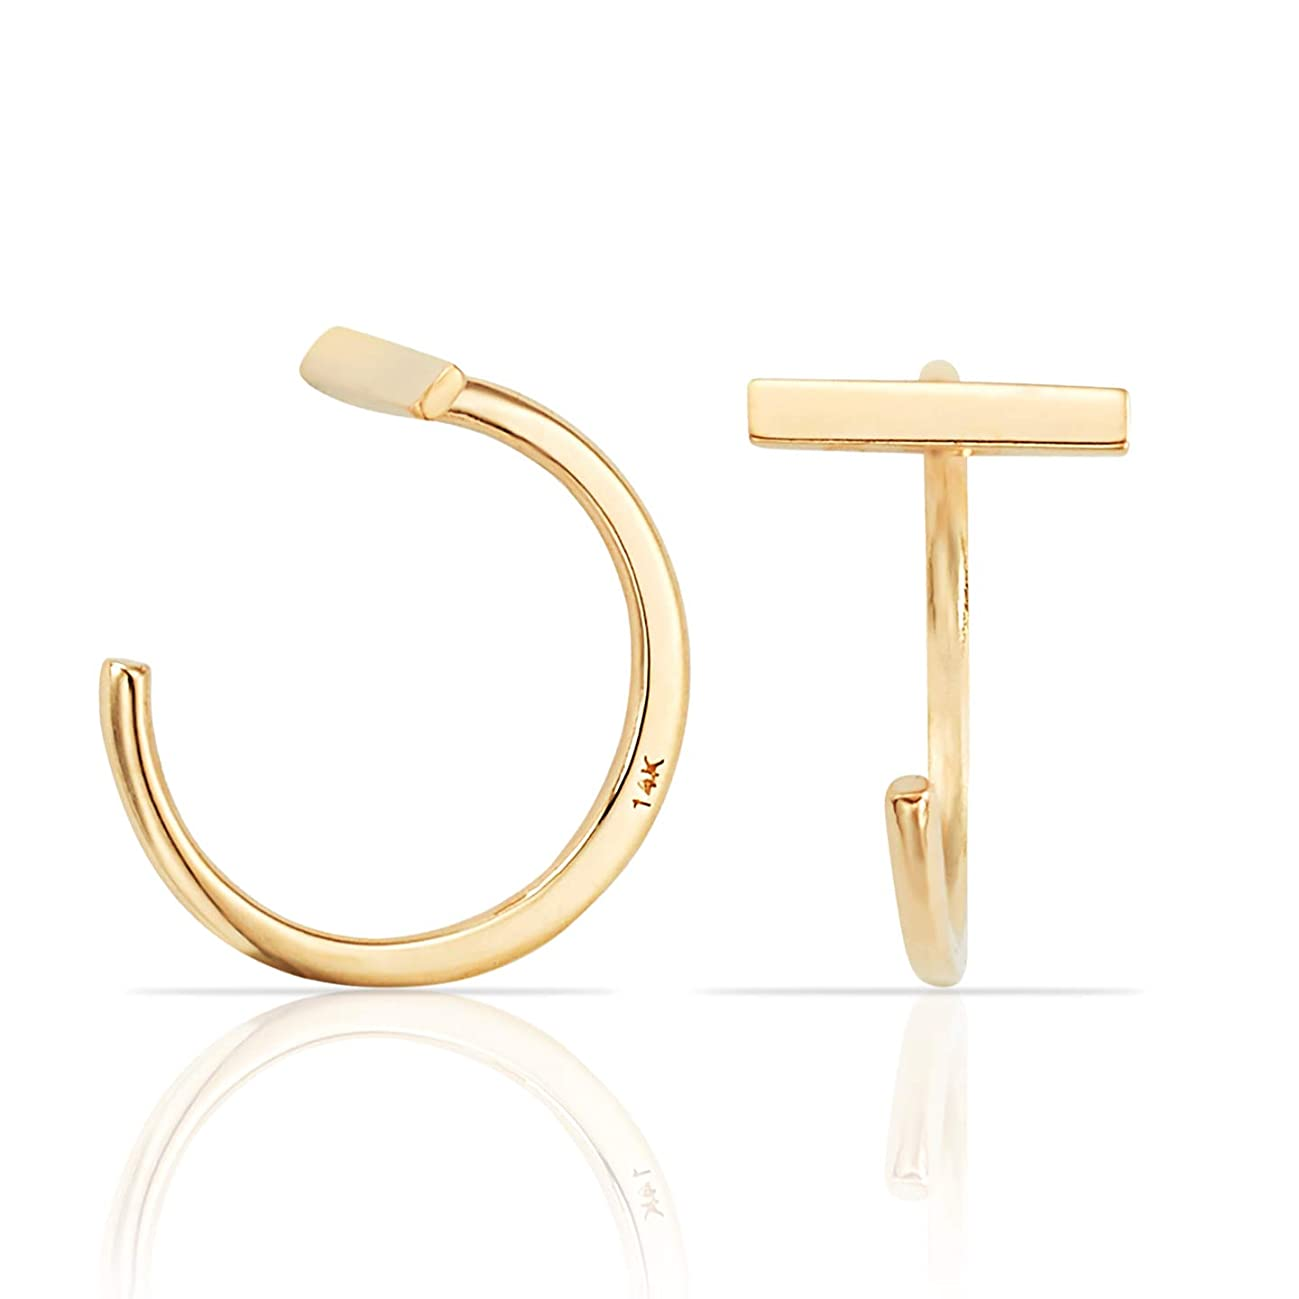 Simple Mini Slip On Huggie Cuff Earrings in Solid 14K Yellow Gold